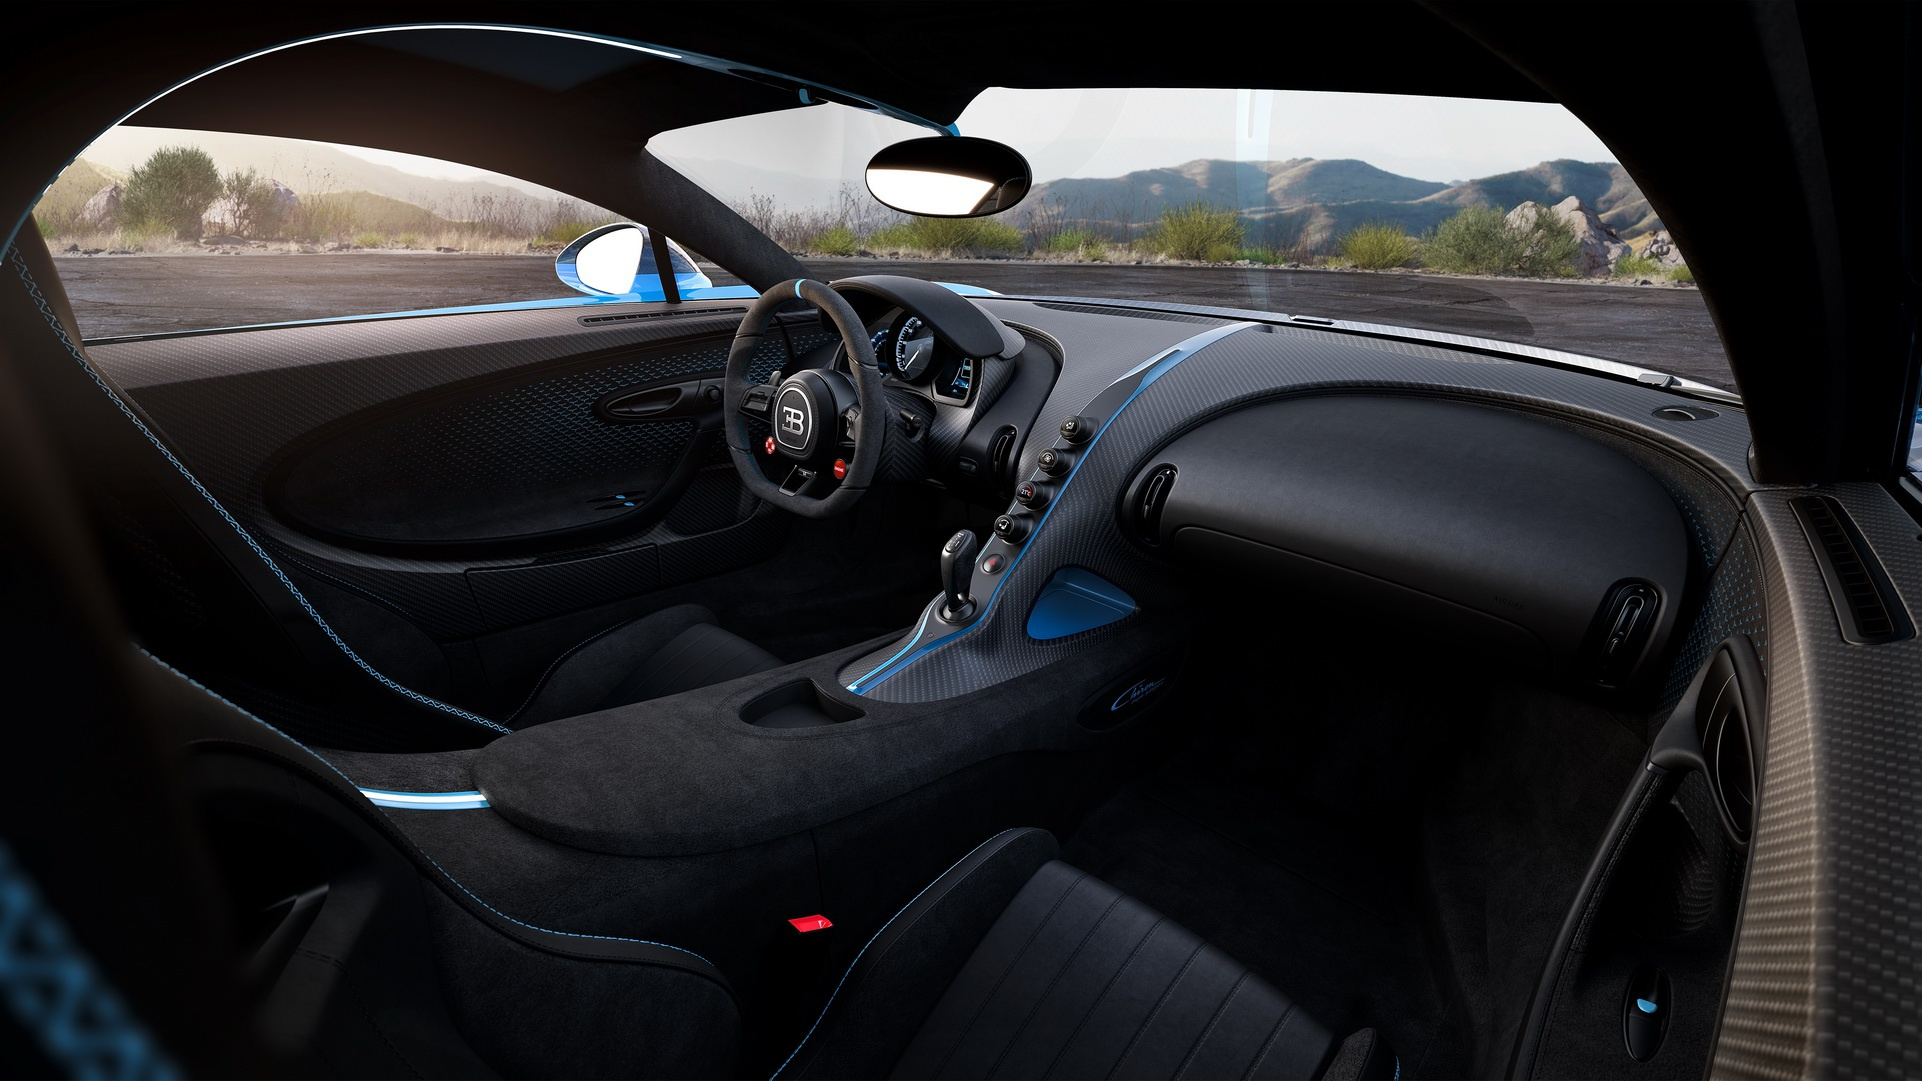 Bugatti Chiron phien ban moi ra mat - sieu xe gia 3,55 trieu USD hinh anh 21 C1.jpg